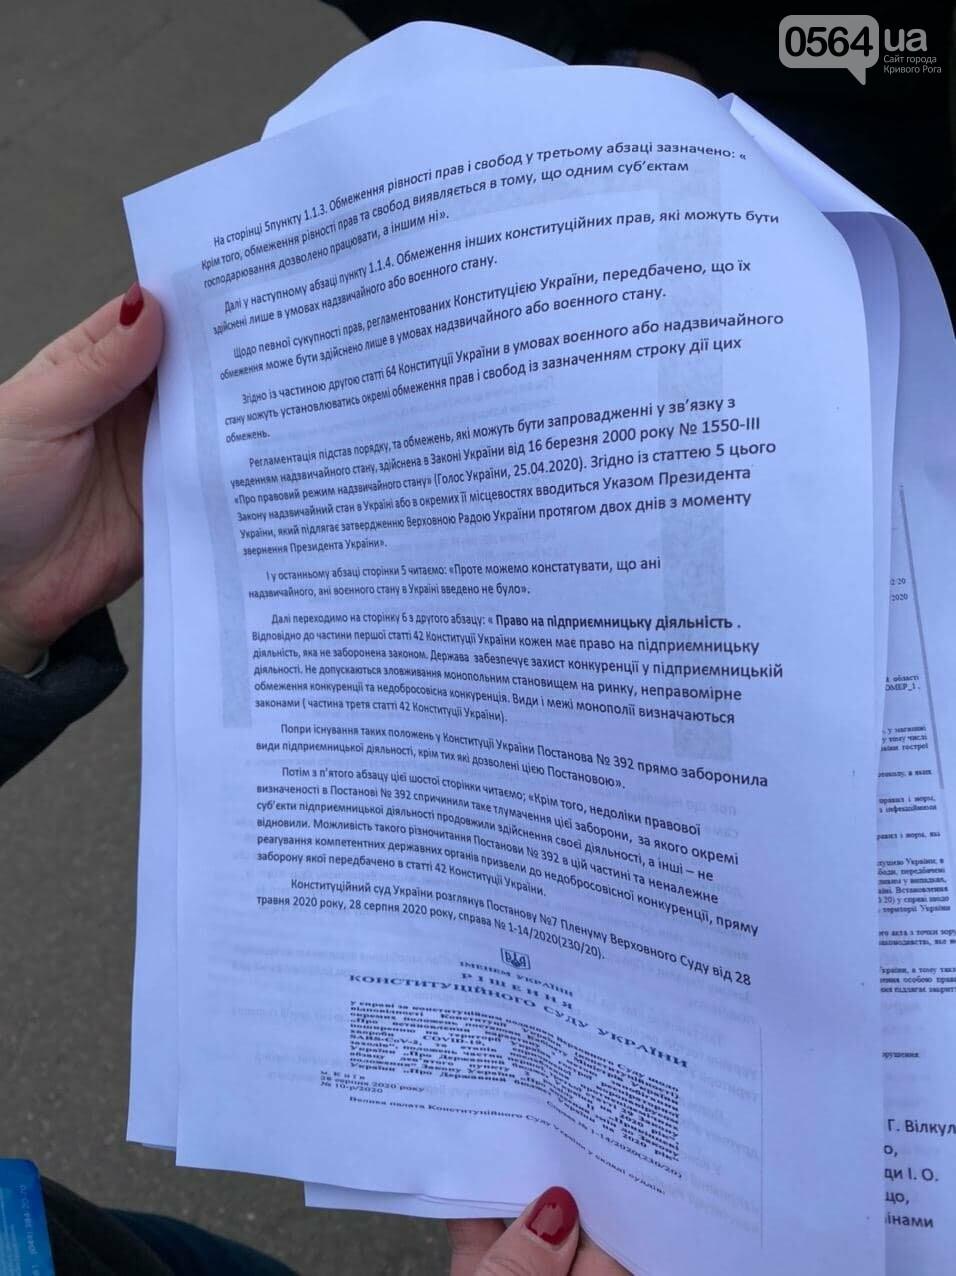 Представители малого бизнеса продолжили протест возле мэрии Кривого Рога, - ФОТО, ВИДЕО, фото-9